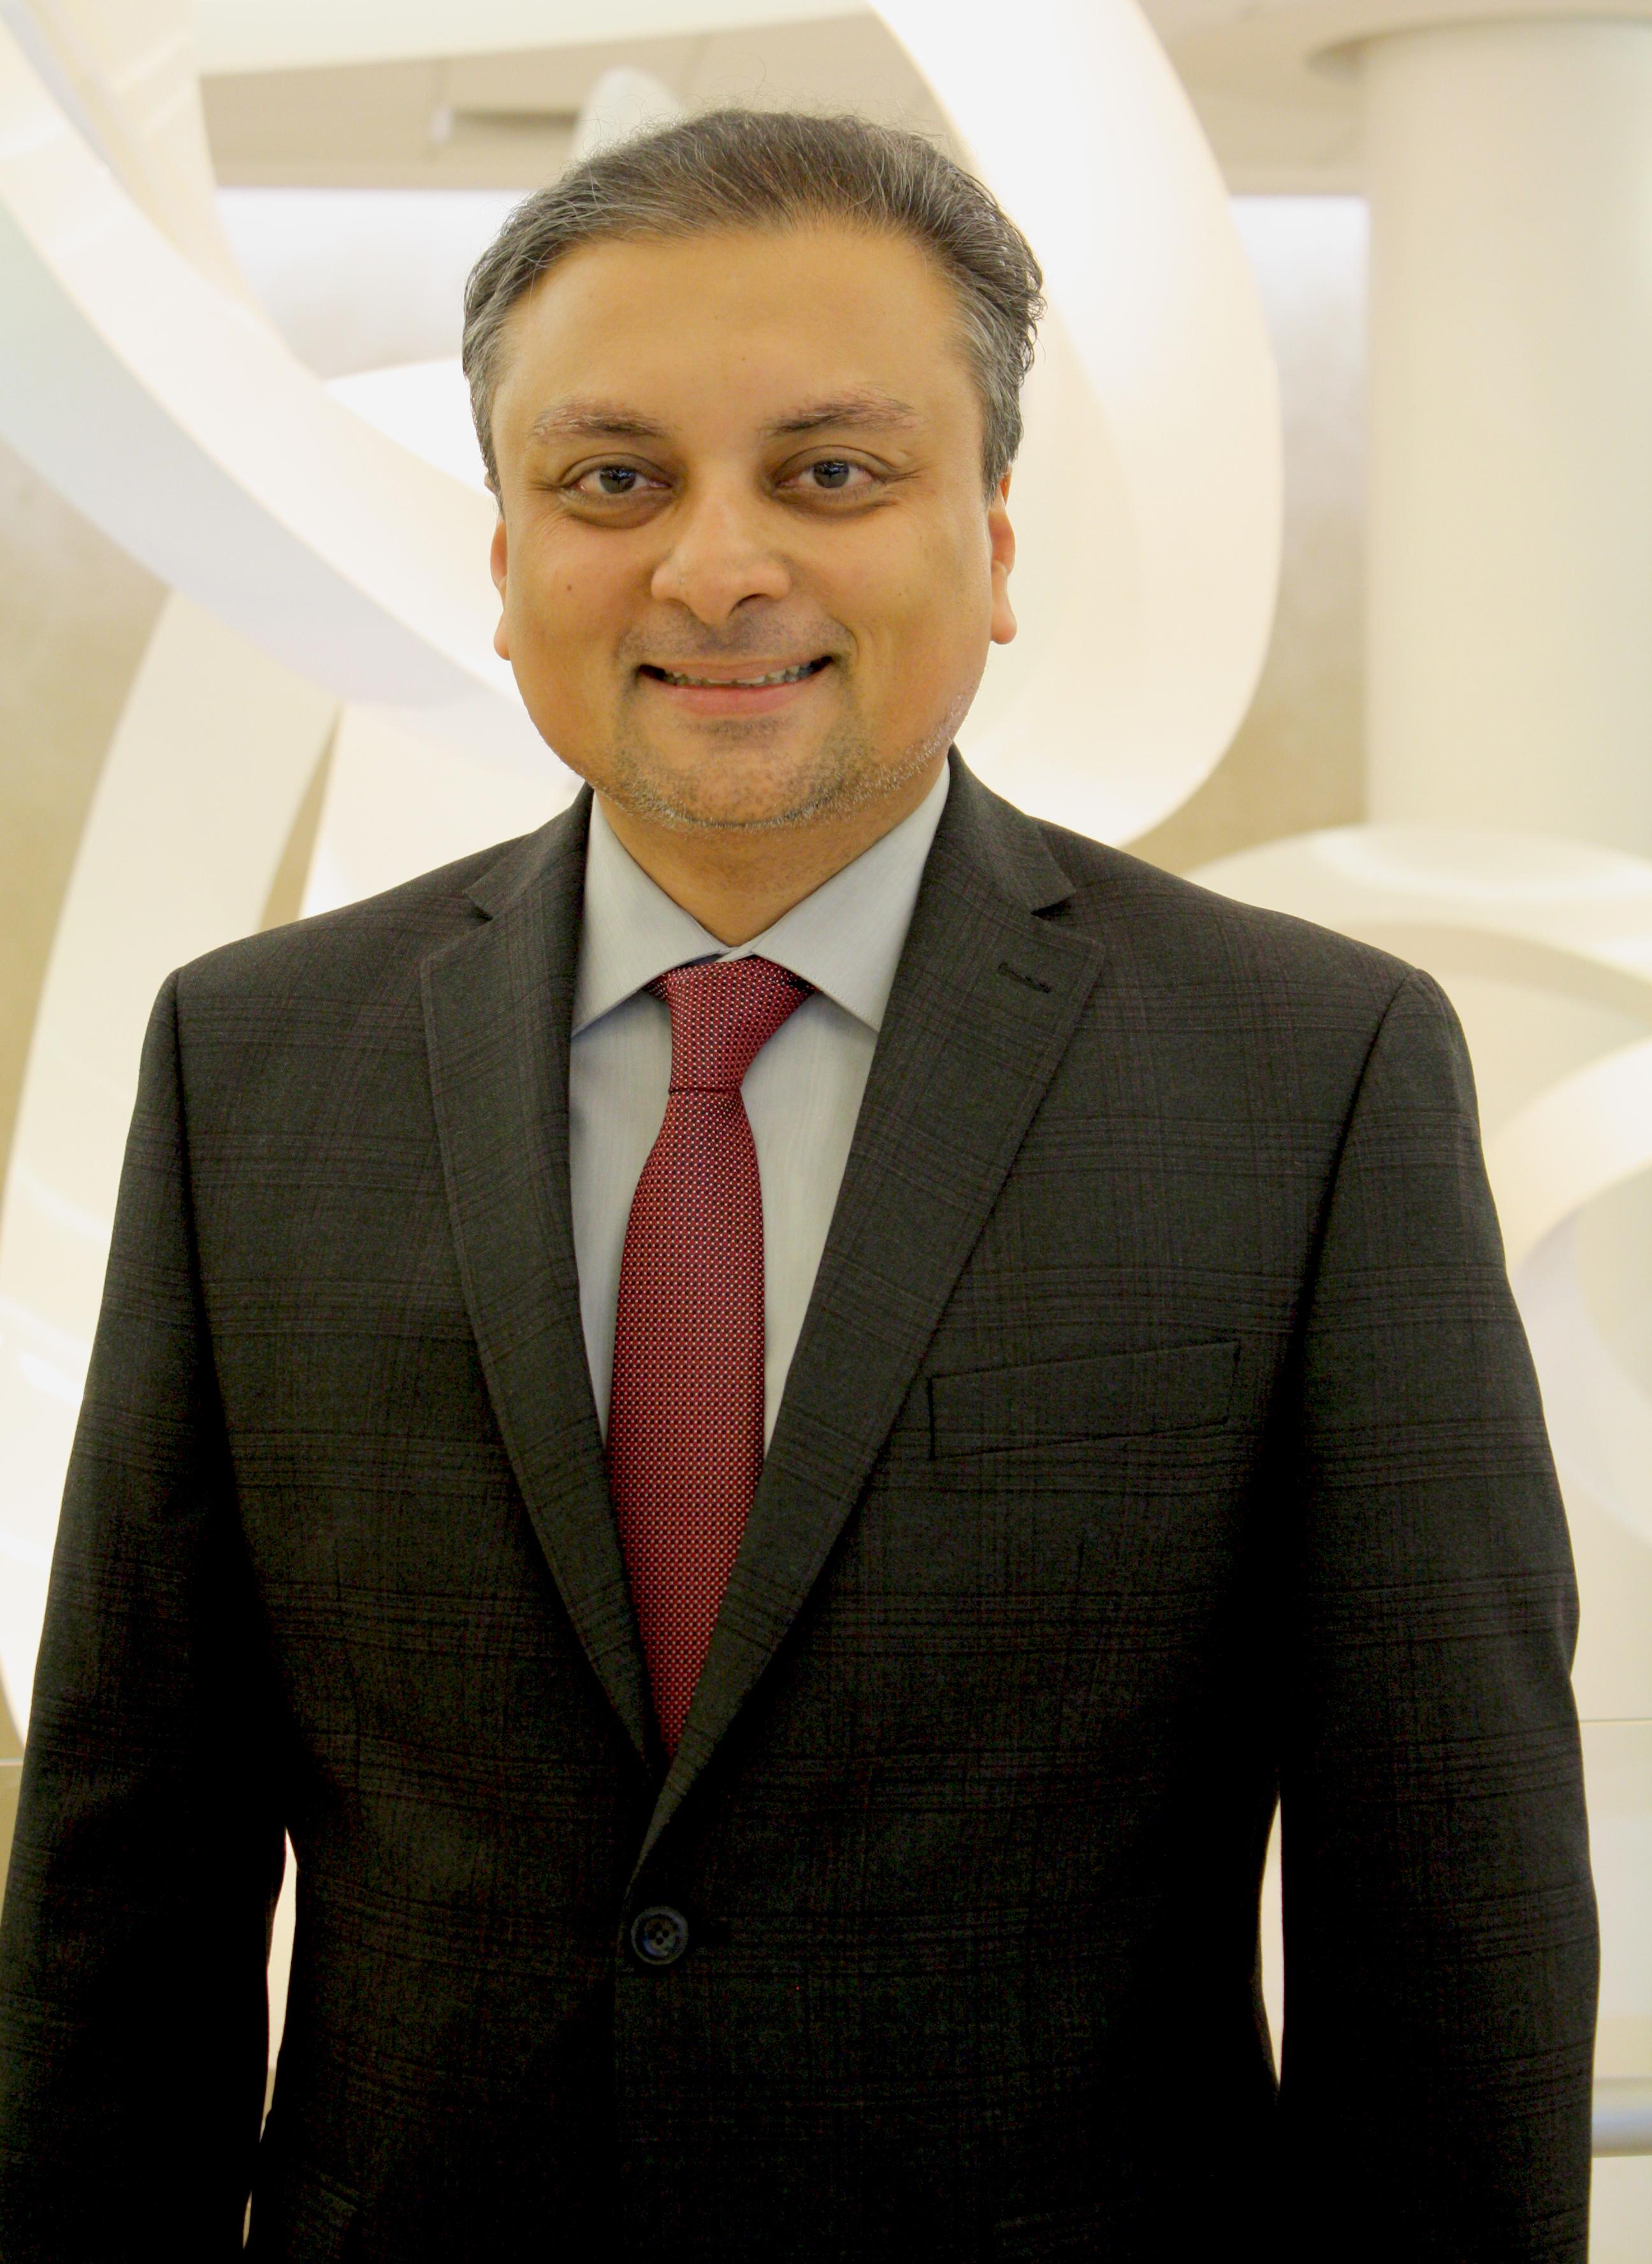 Syed Husain, MD